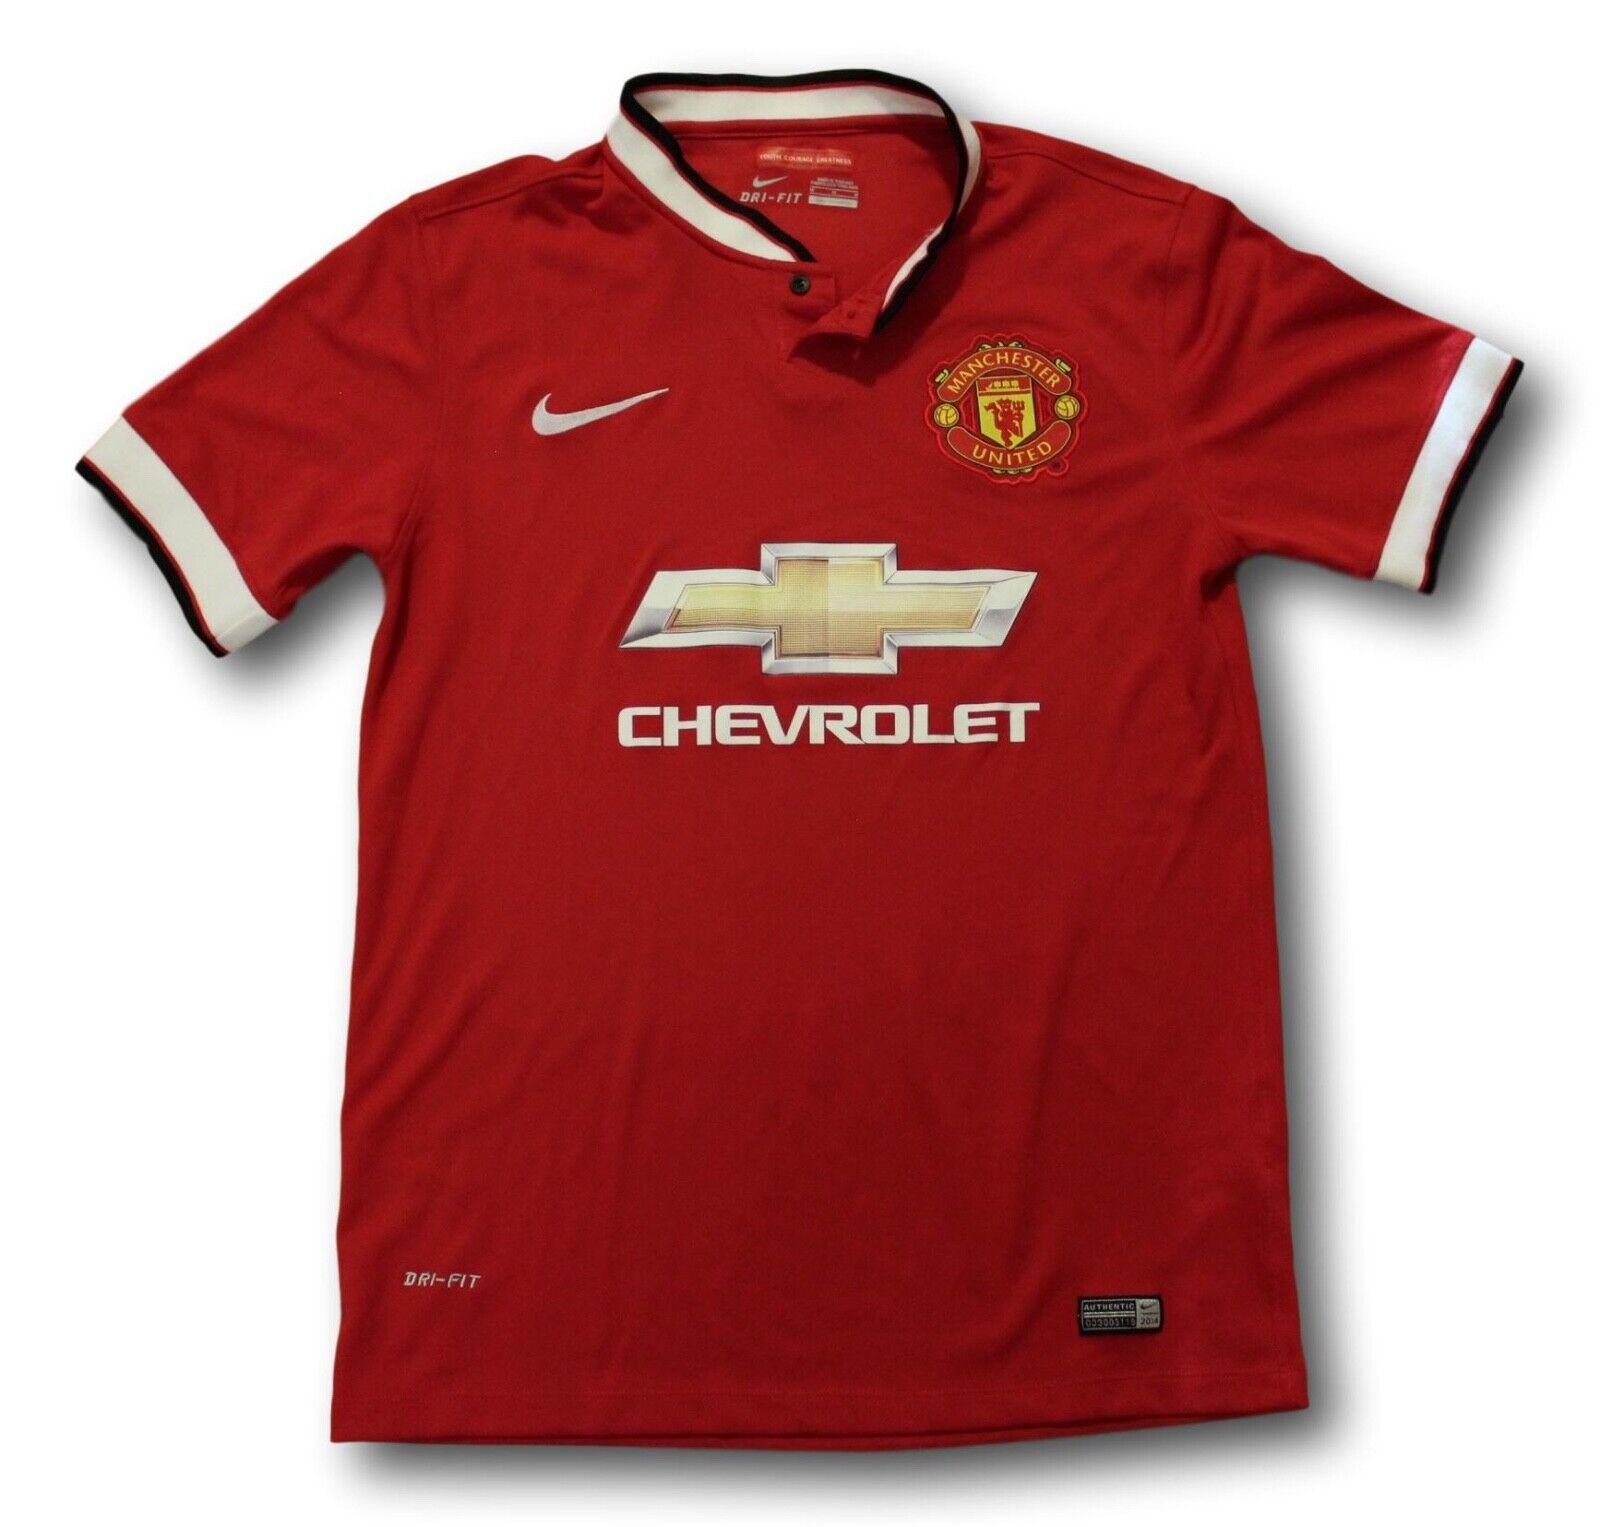 2014-15 Men's Manchester United Home Soccer Football Shirt Jersey Size M